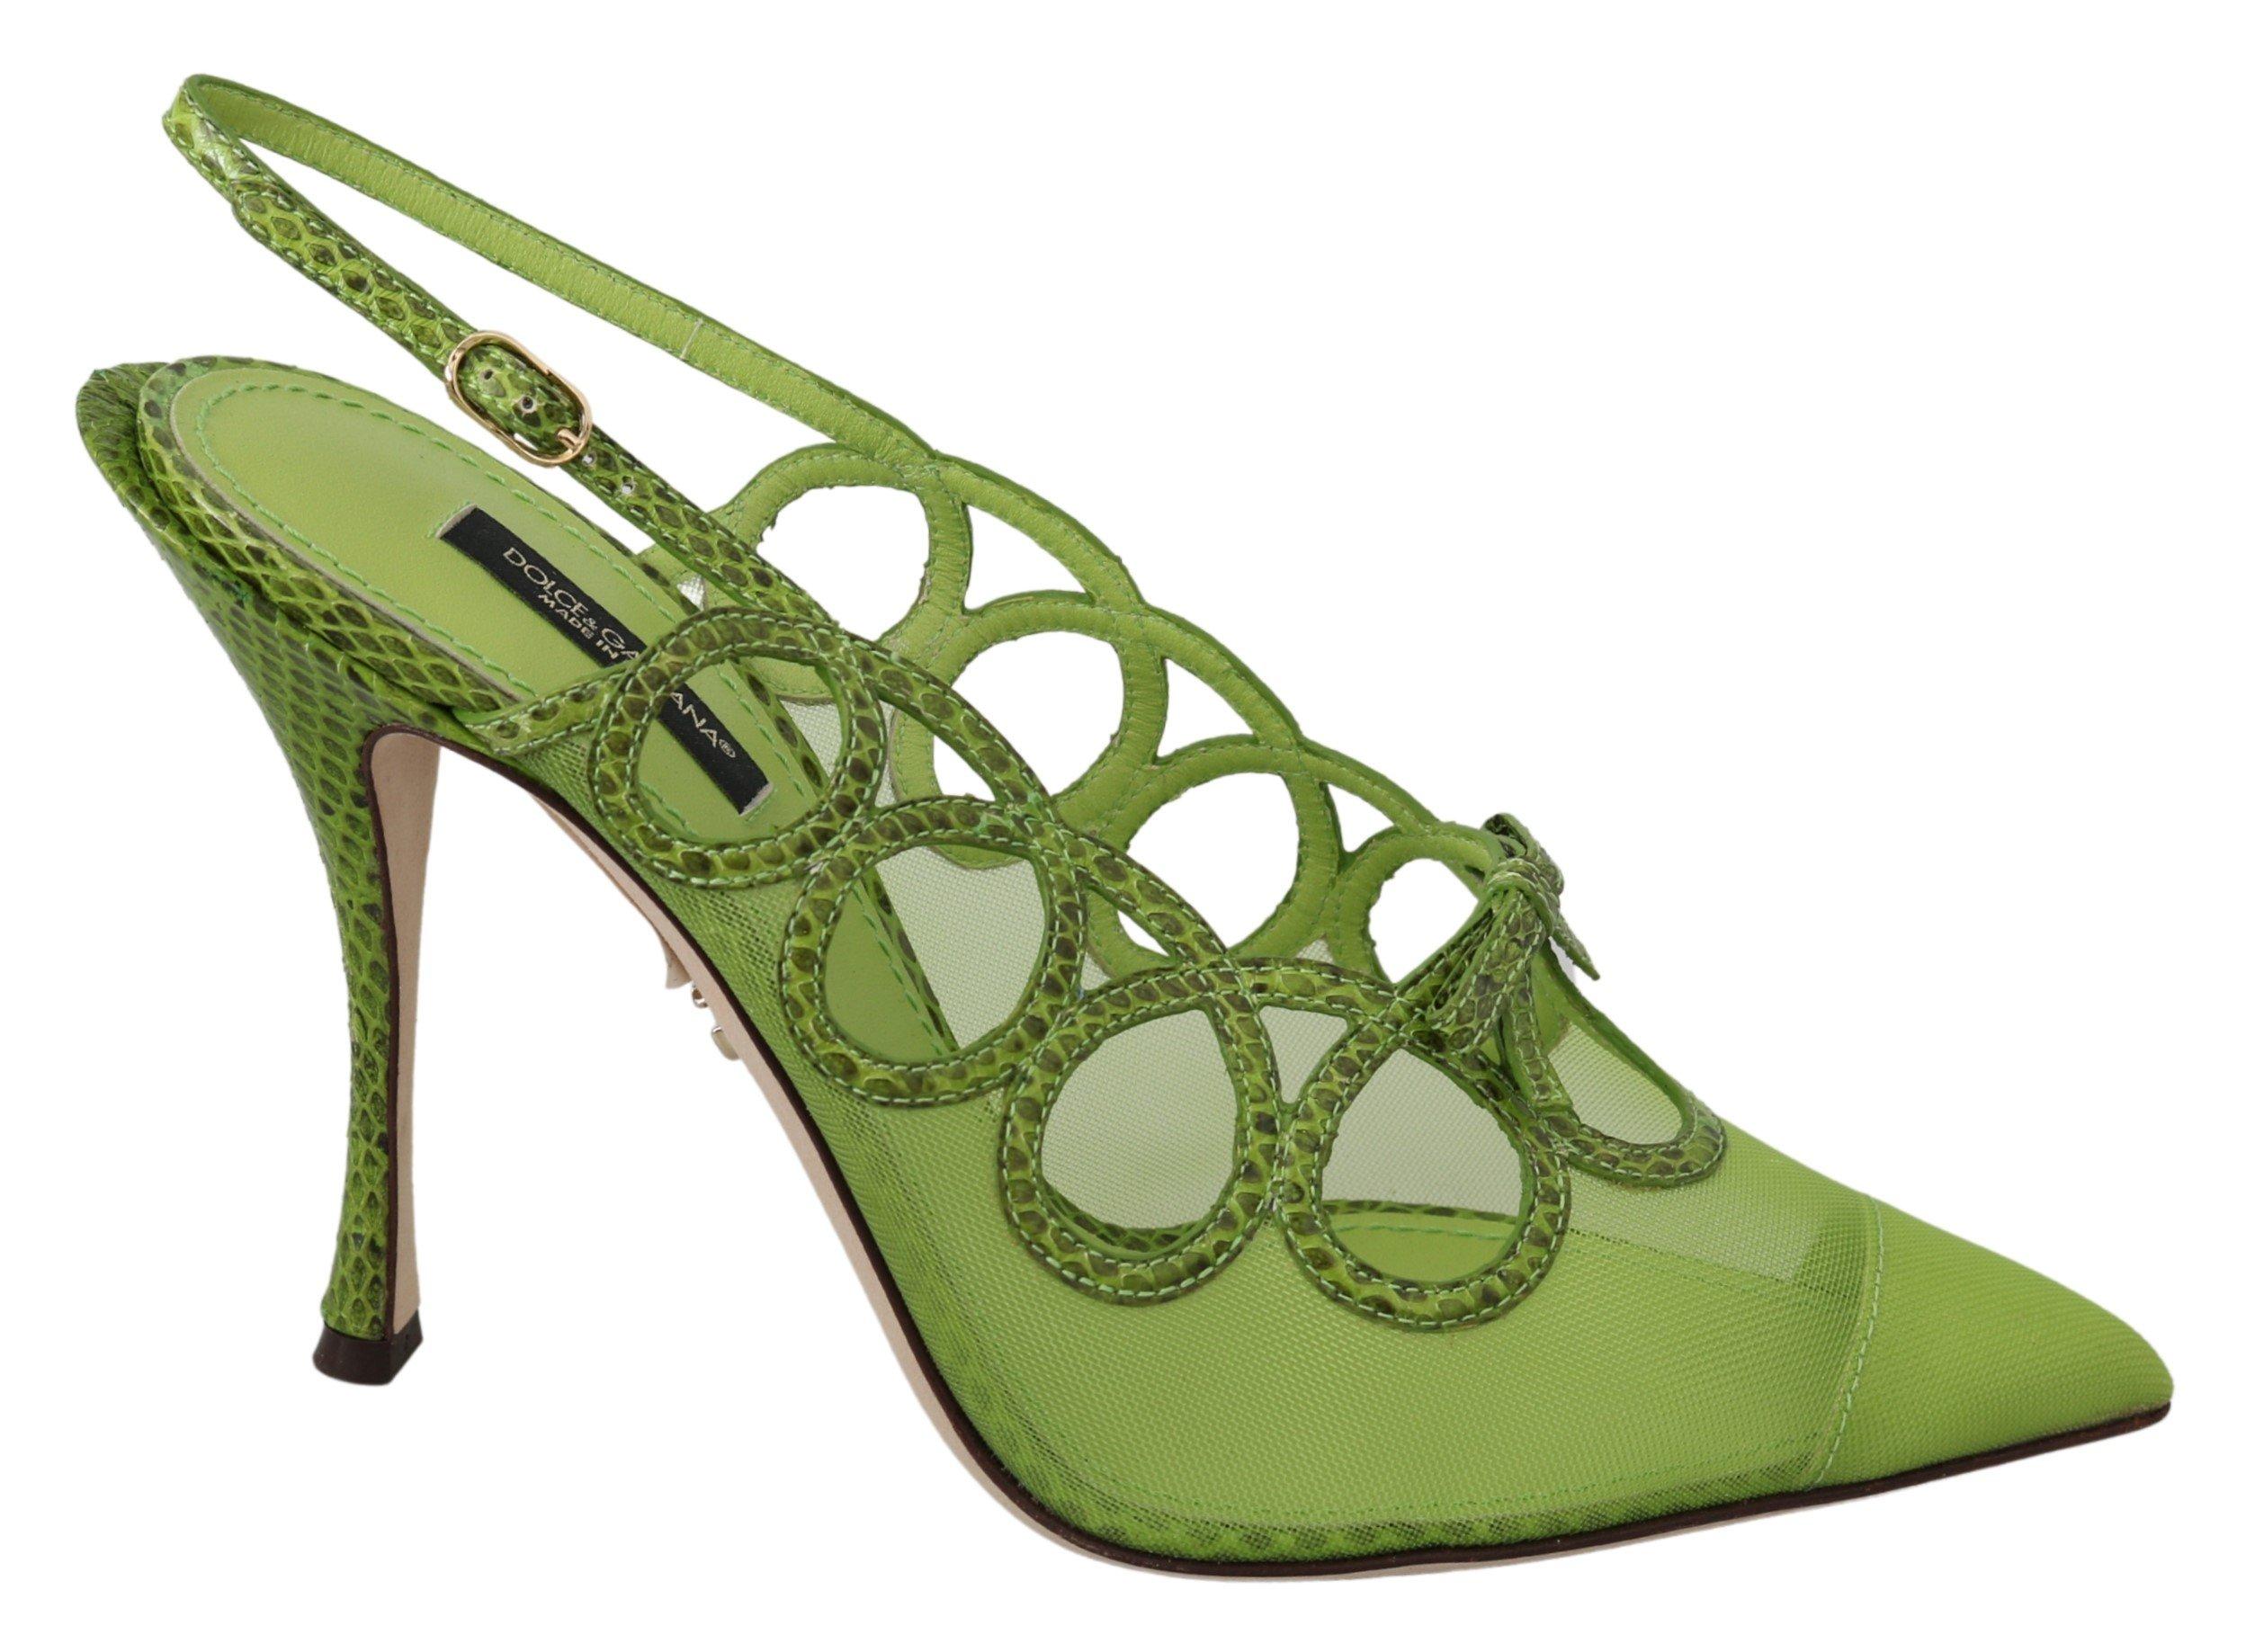 Dolce & Gabbana Slim High Slingbacks Leather Pumps Green LA6827 - EU39/US8.5